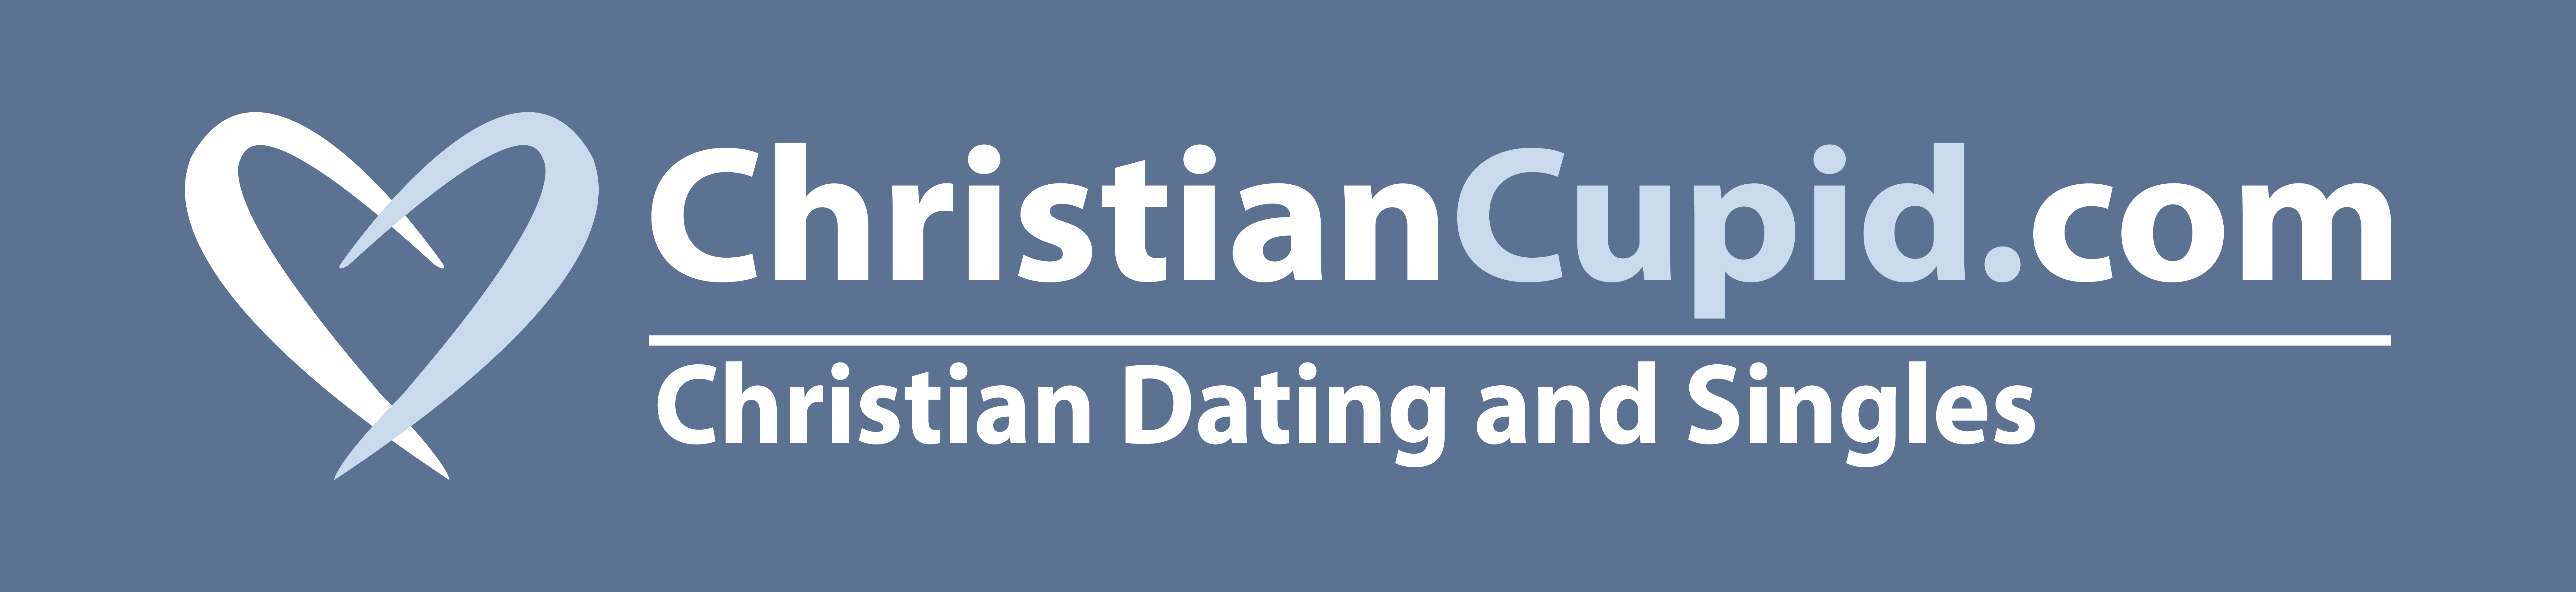 Christian Cupid